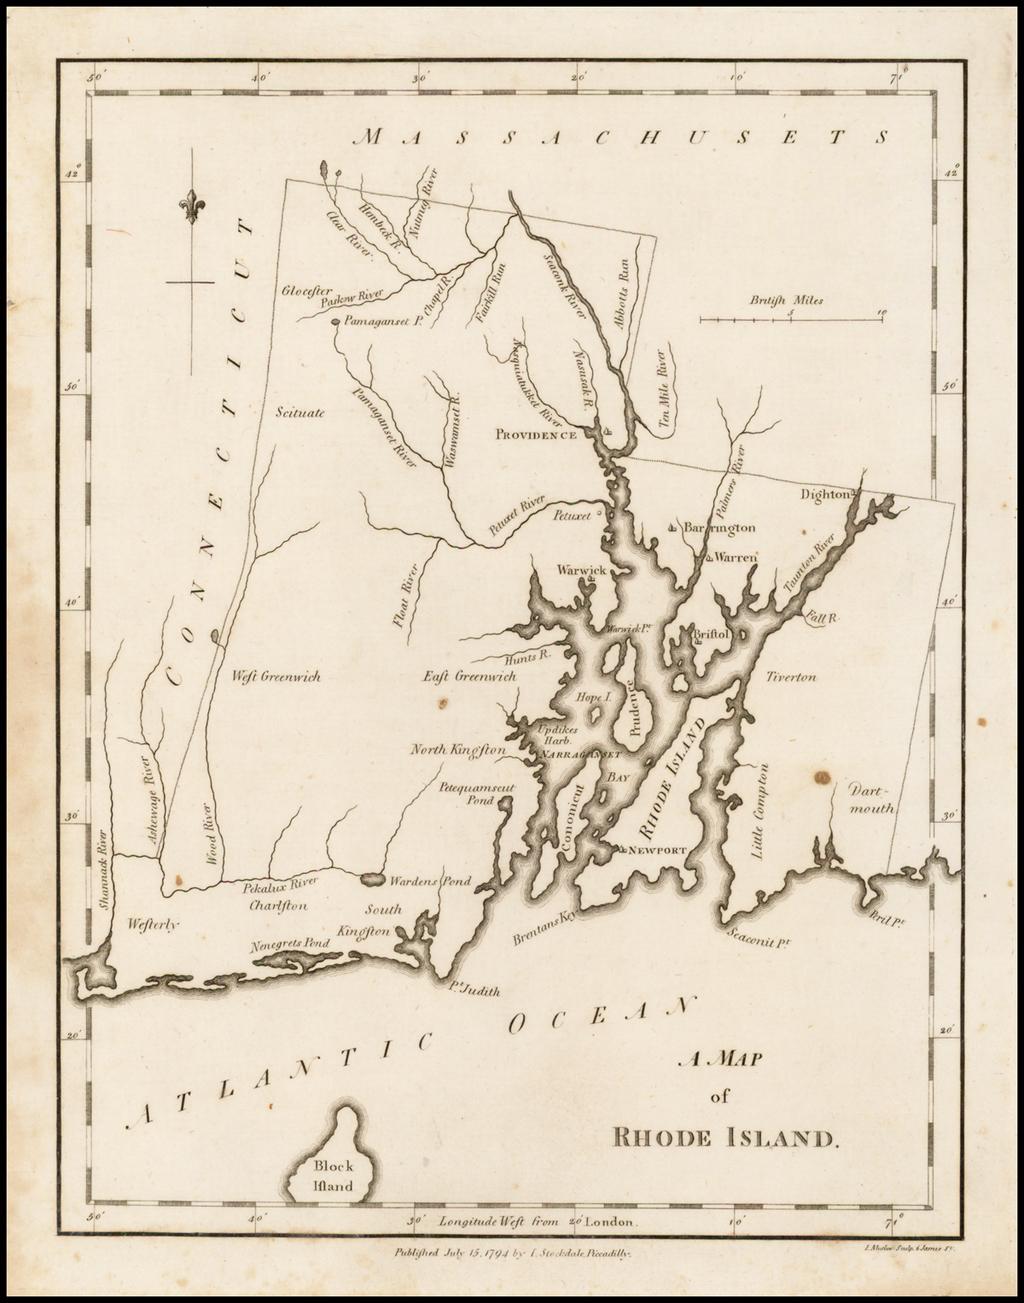 A Map of Rhode Island By John Stockdale